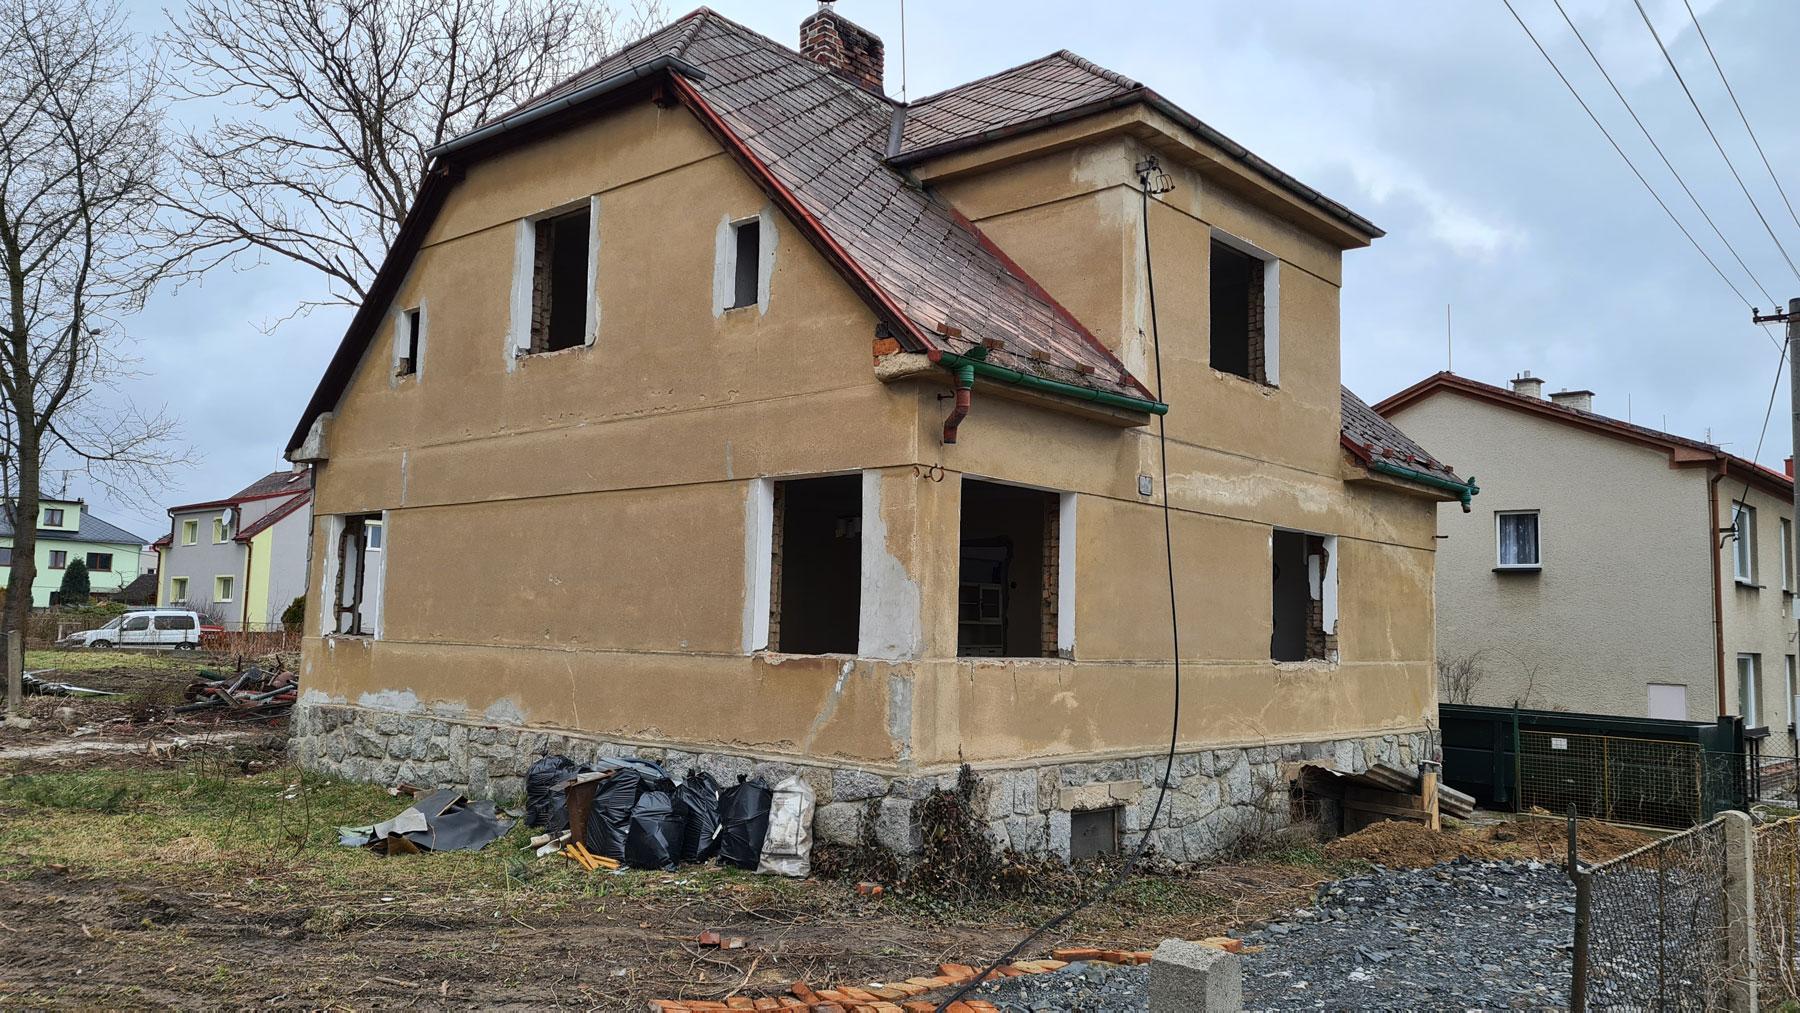 Nove-byty-Klatovy-zahajeni-demolice-Rezidence-pod-Sumavou (6)